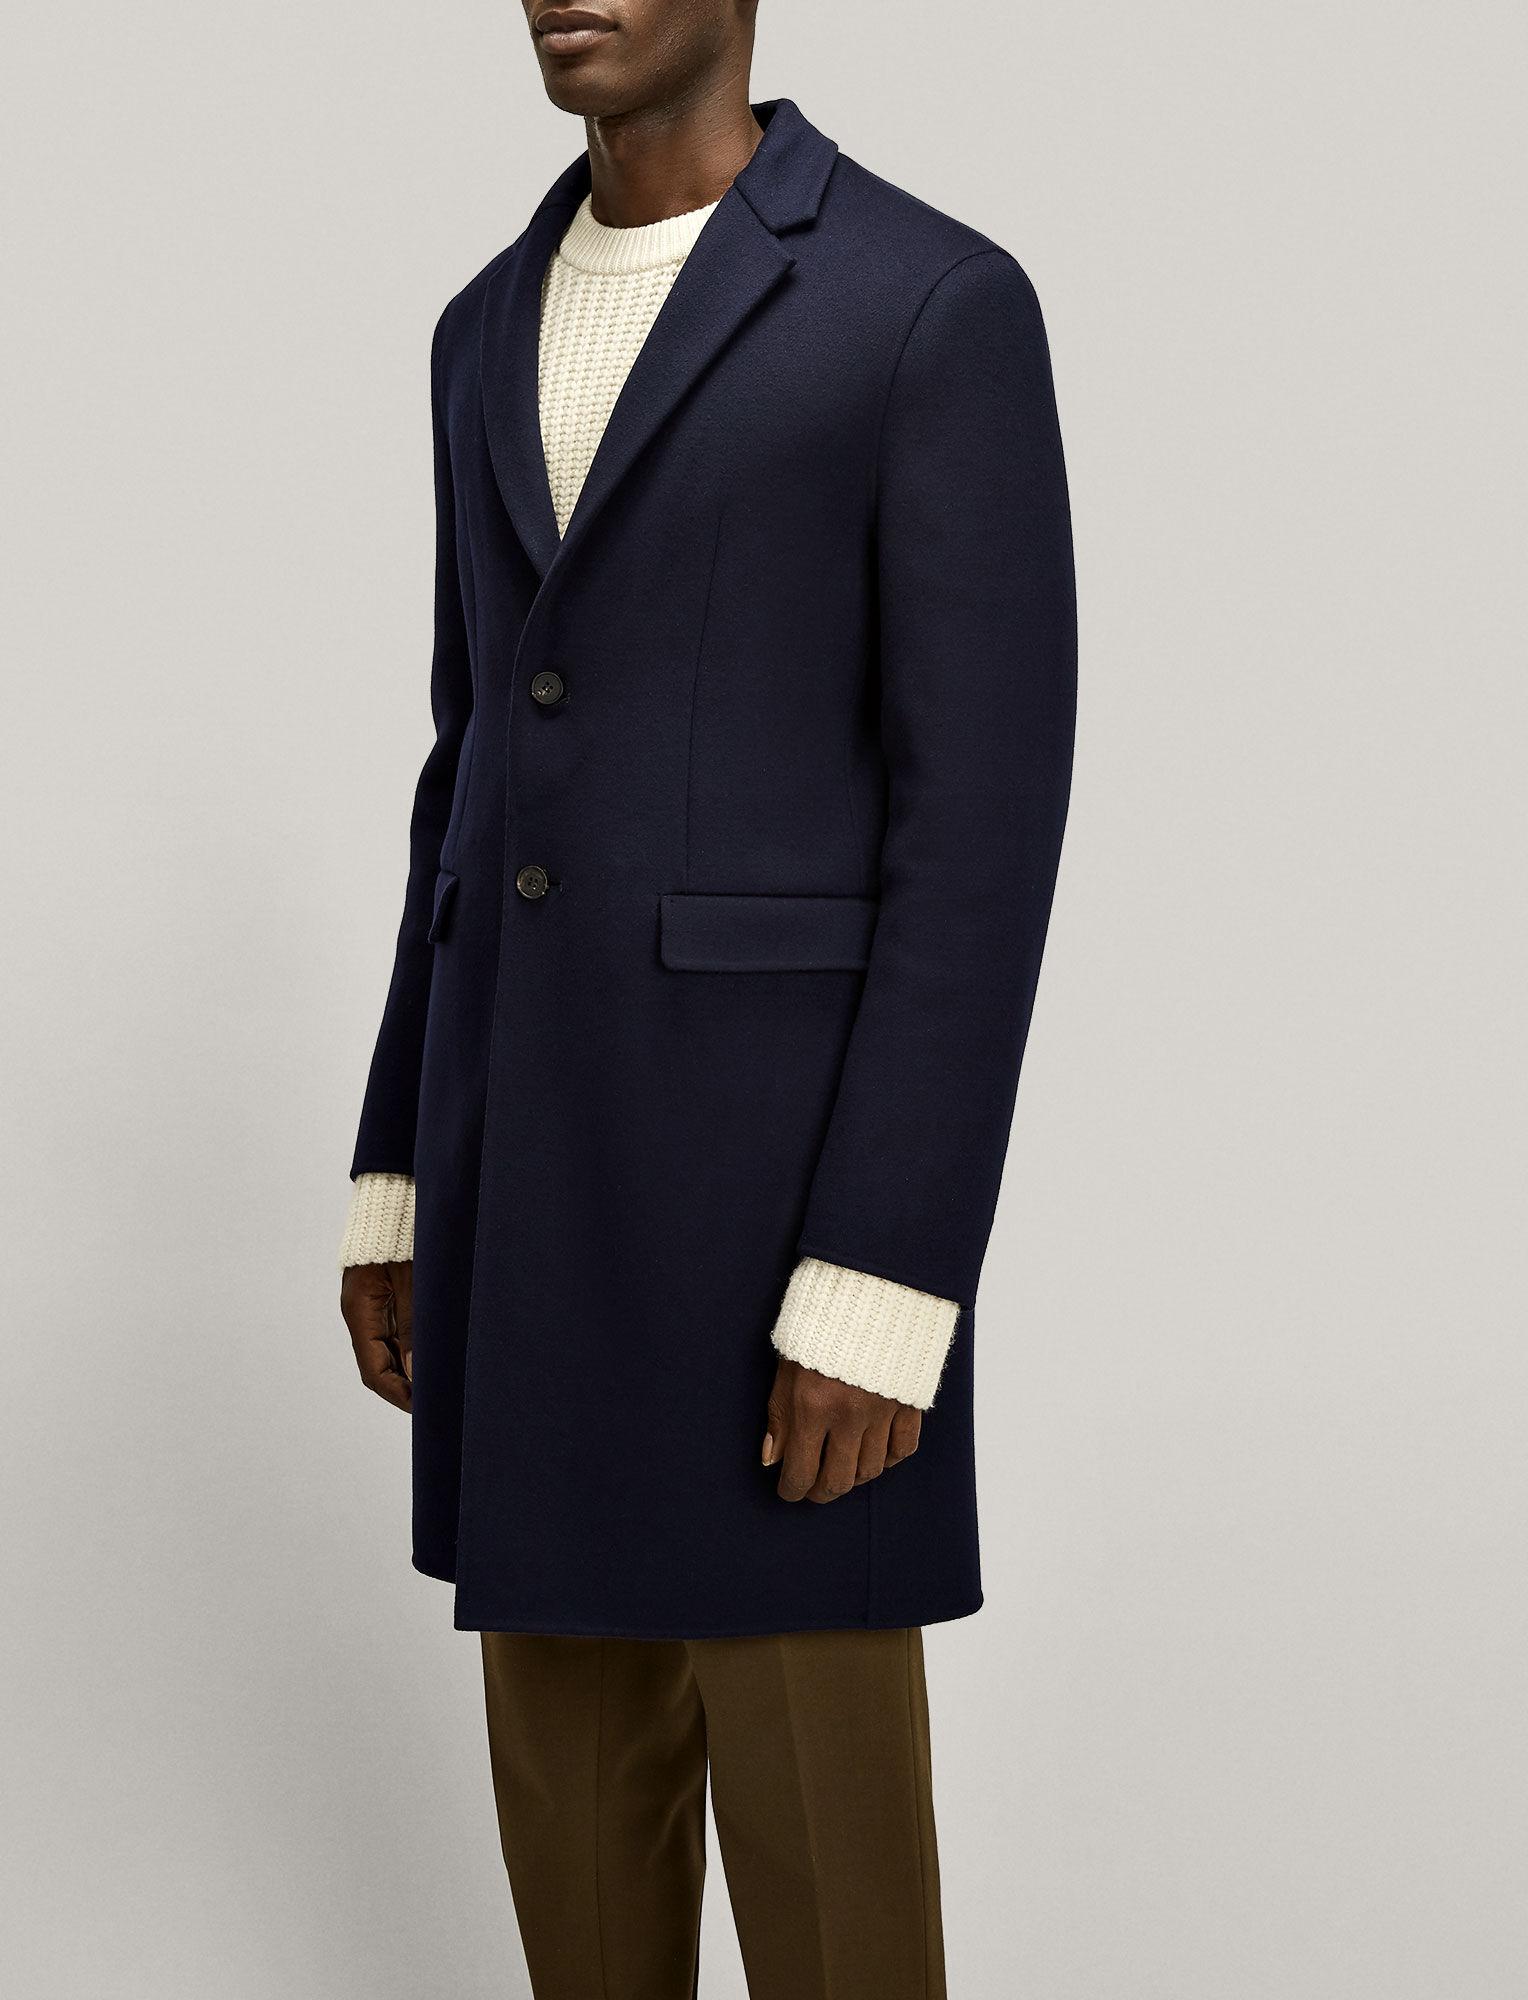 Joseph, Armand Luxe Double Wool Coat, in NAVY